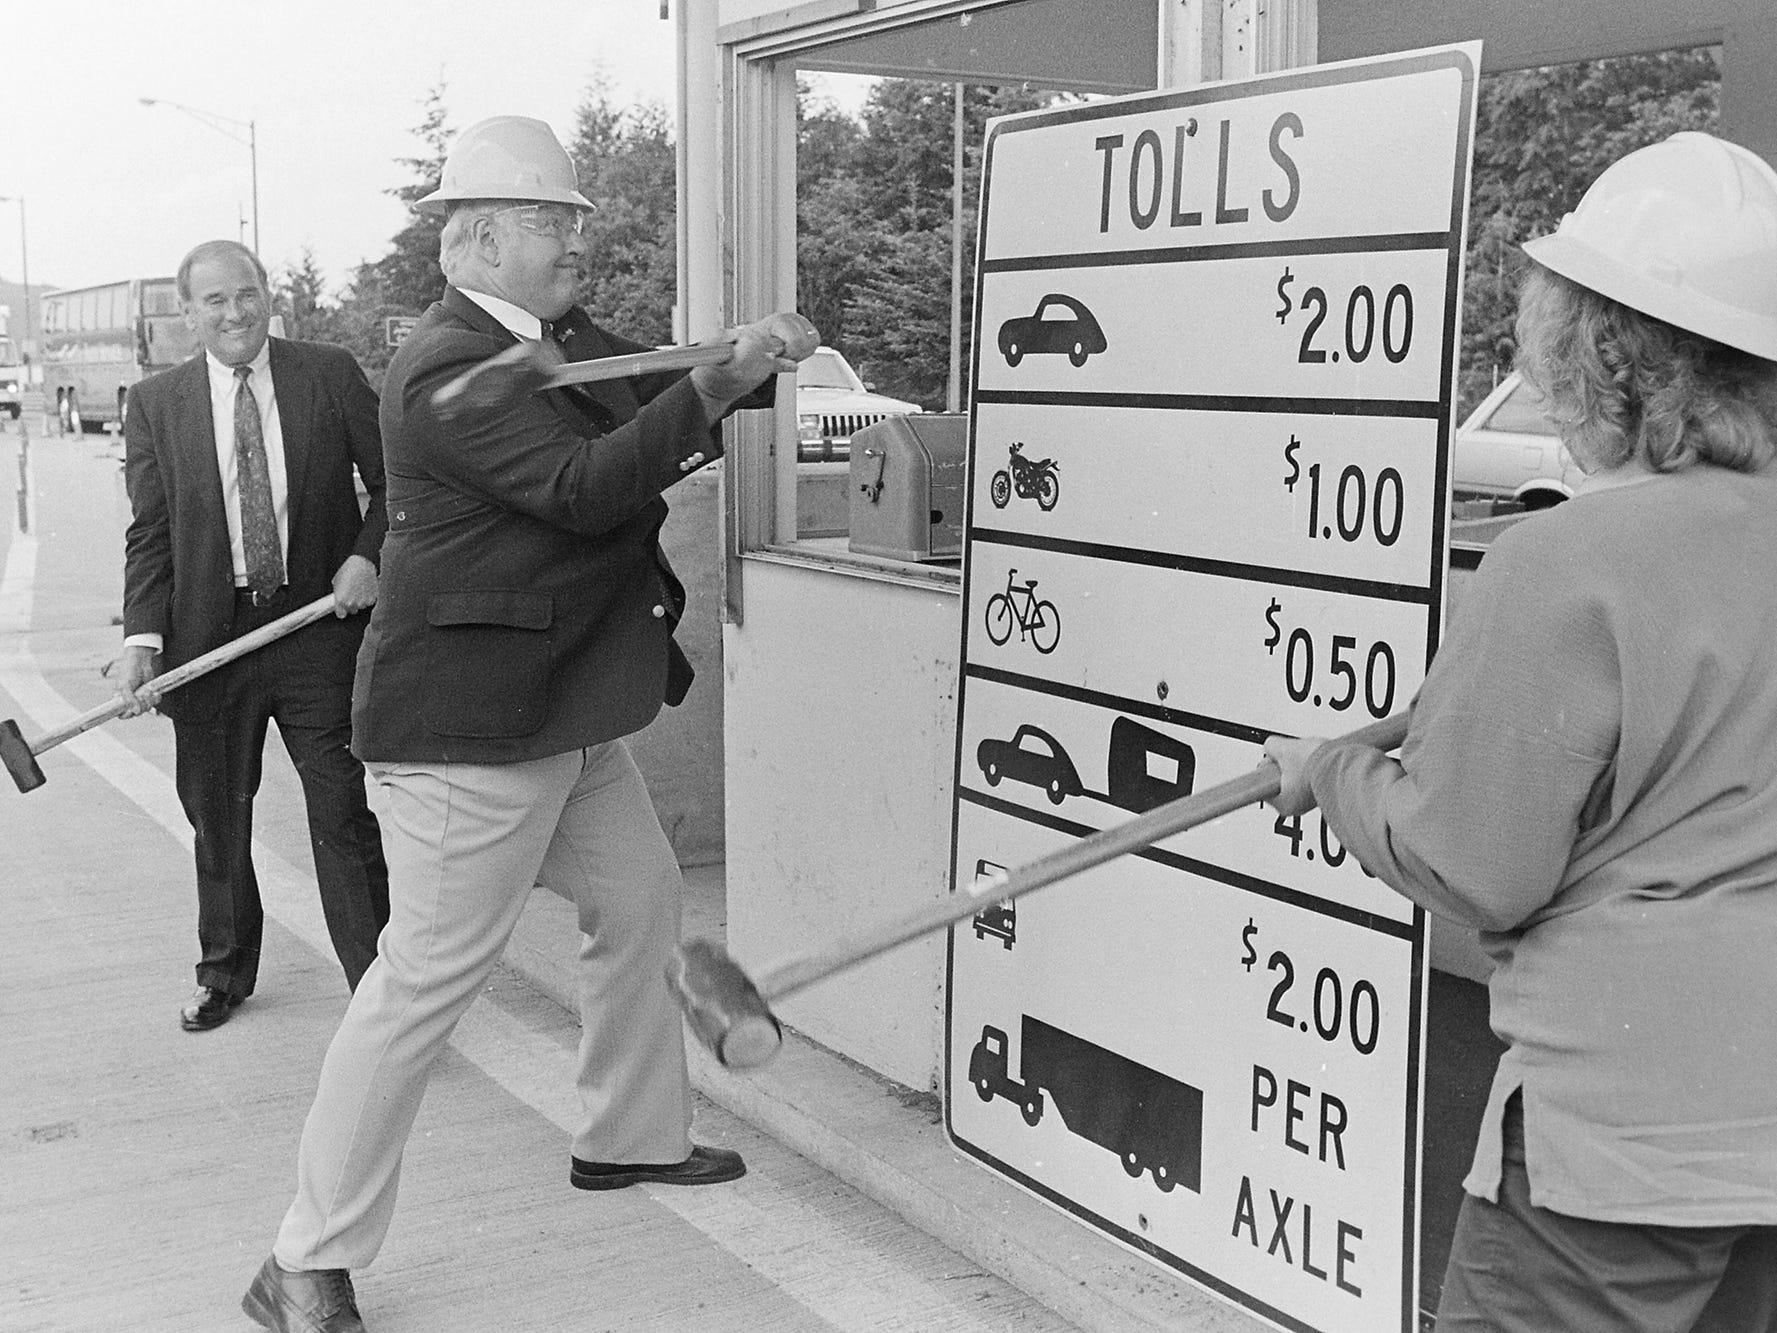 06/19/90Bridge Toll Booths